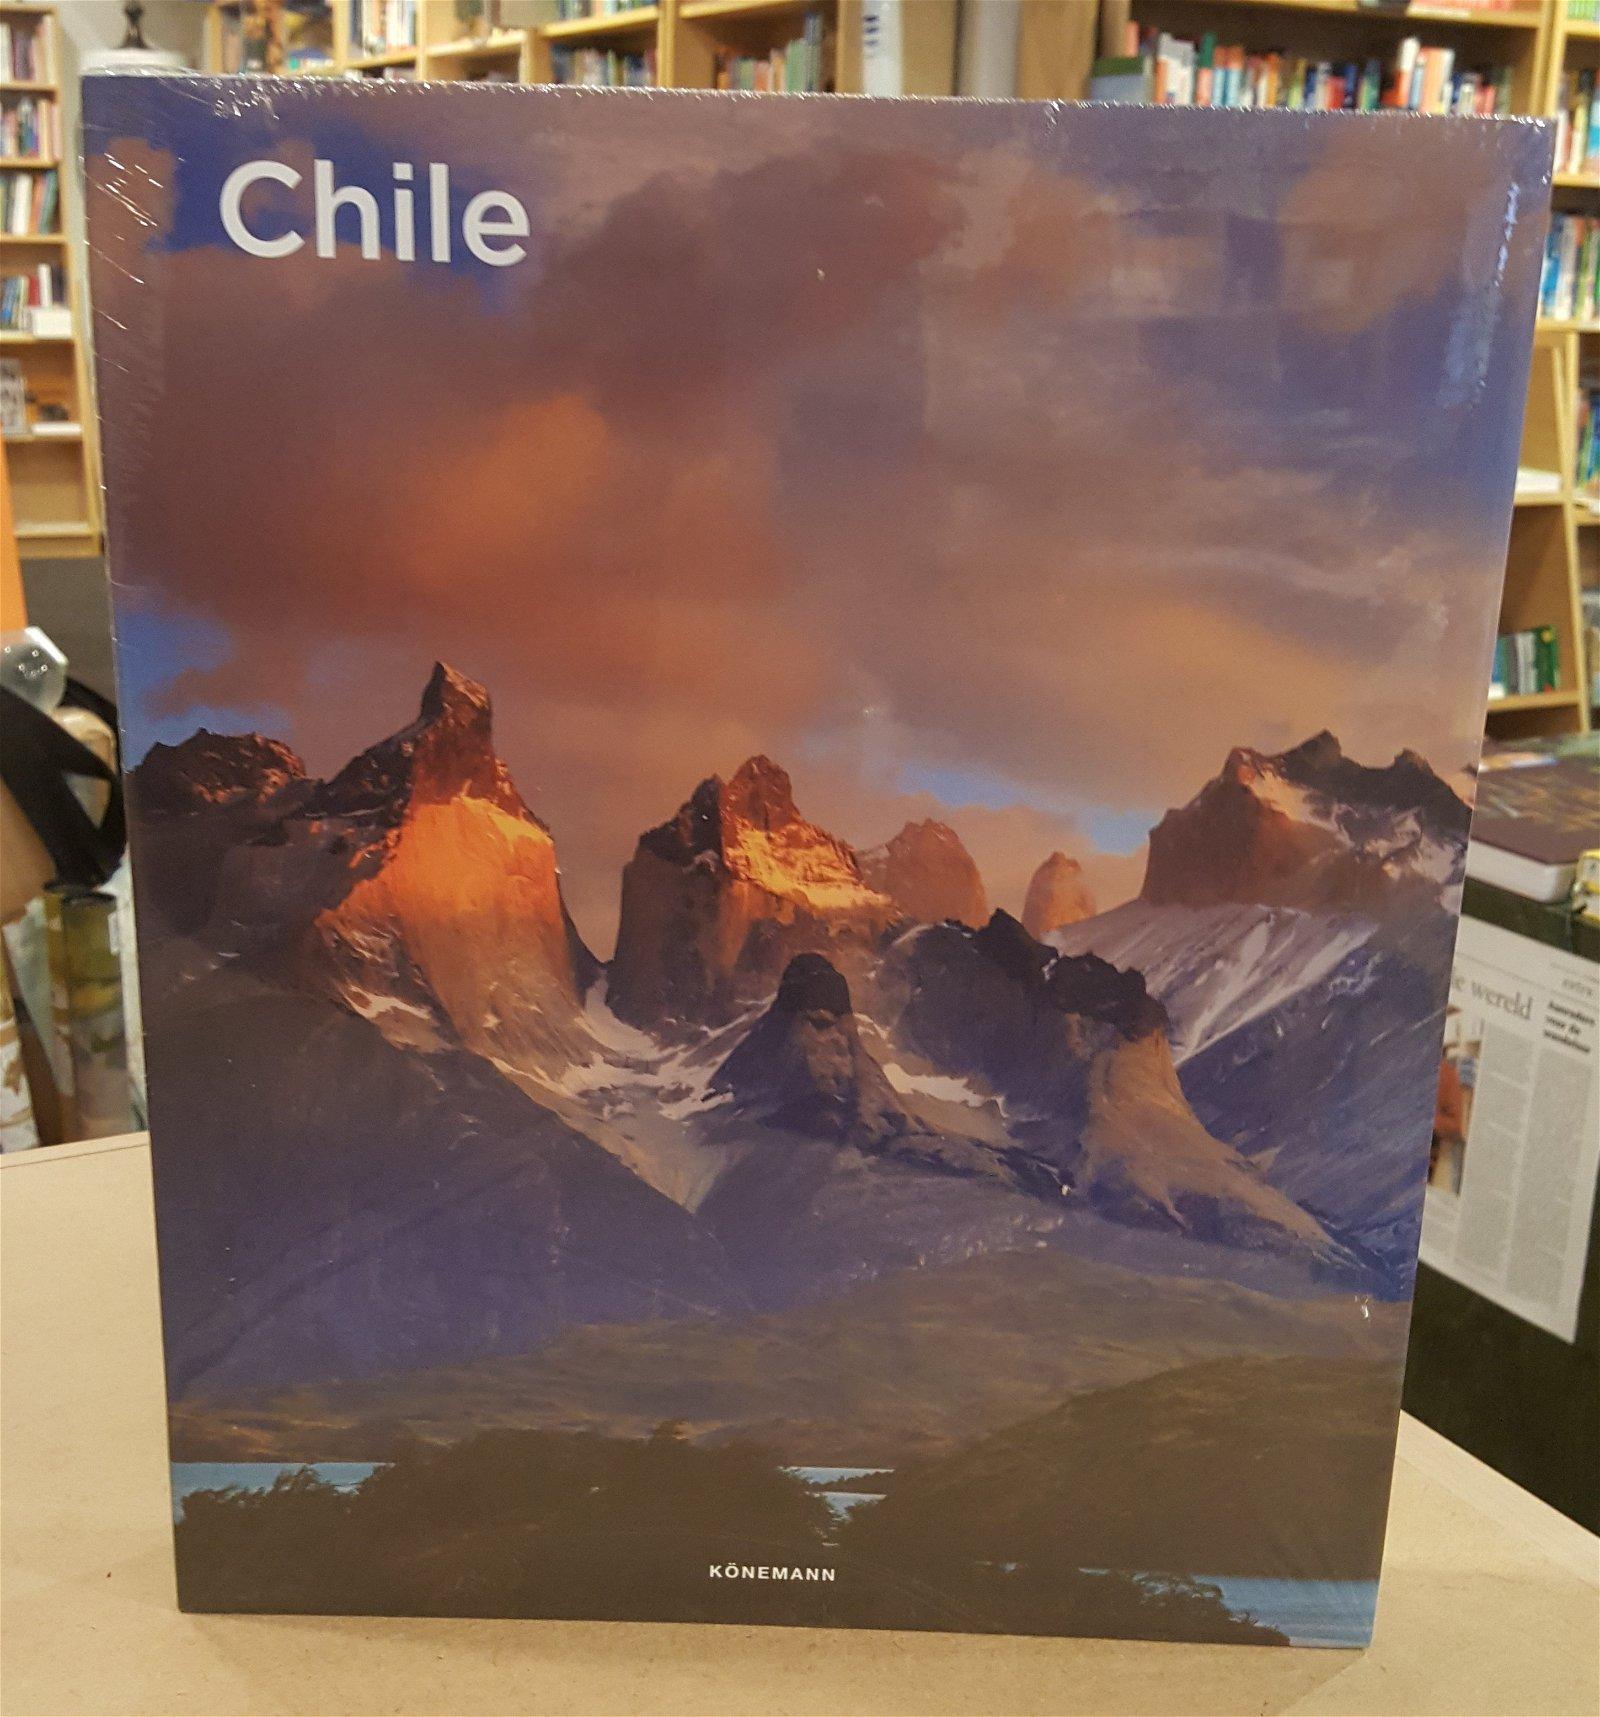 Chile | fotoboek Chili 9783741920196  Könemann   Fotoboeken Chili, Argentinië, Patagonië